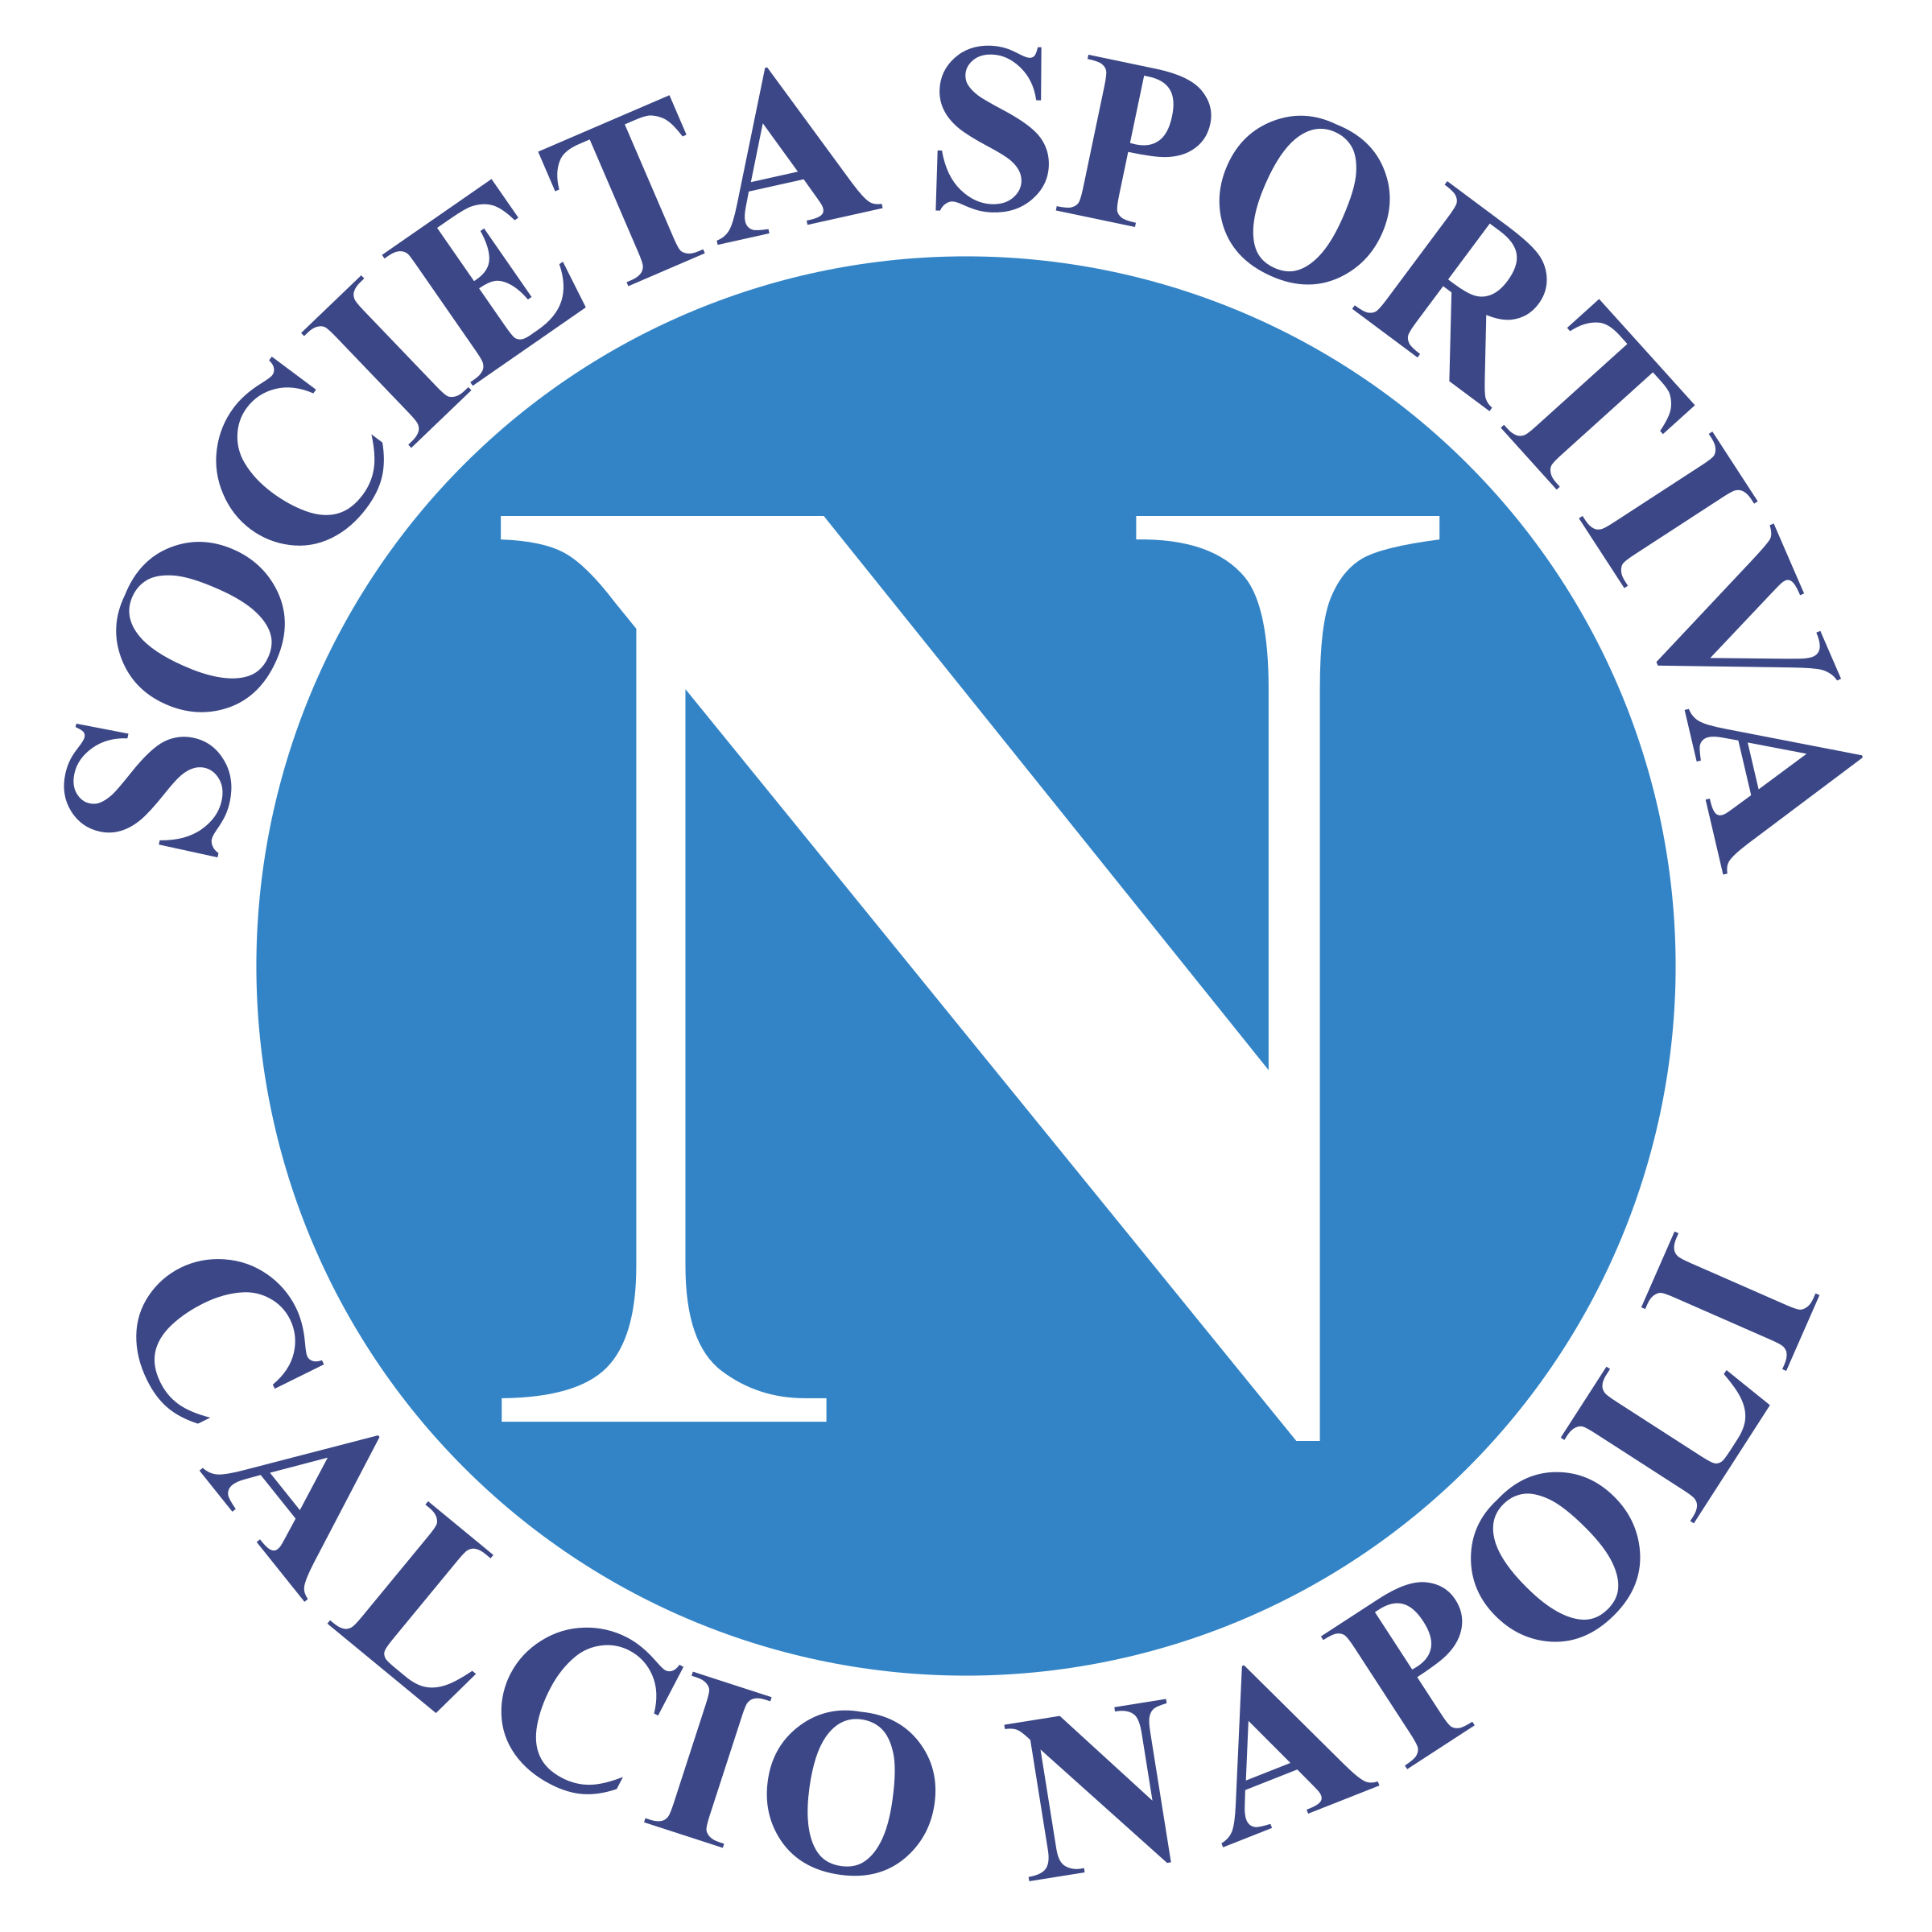 Napoli Logo PNG Transparent & SVG Vector.